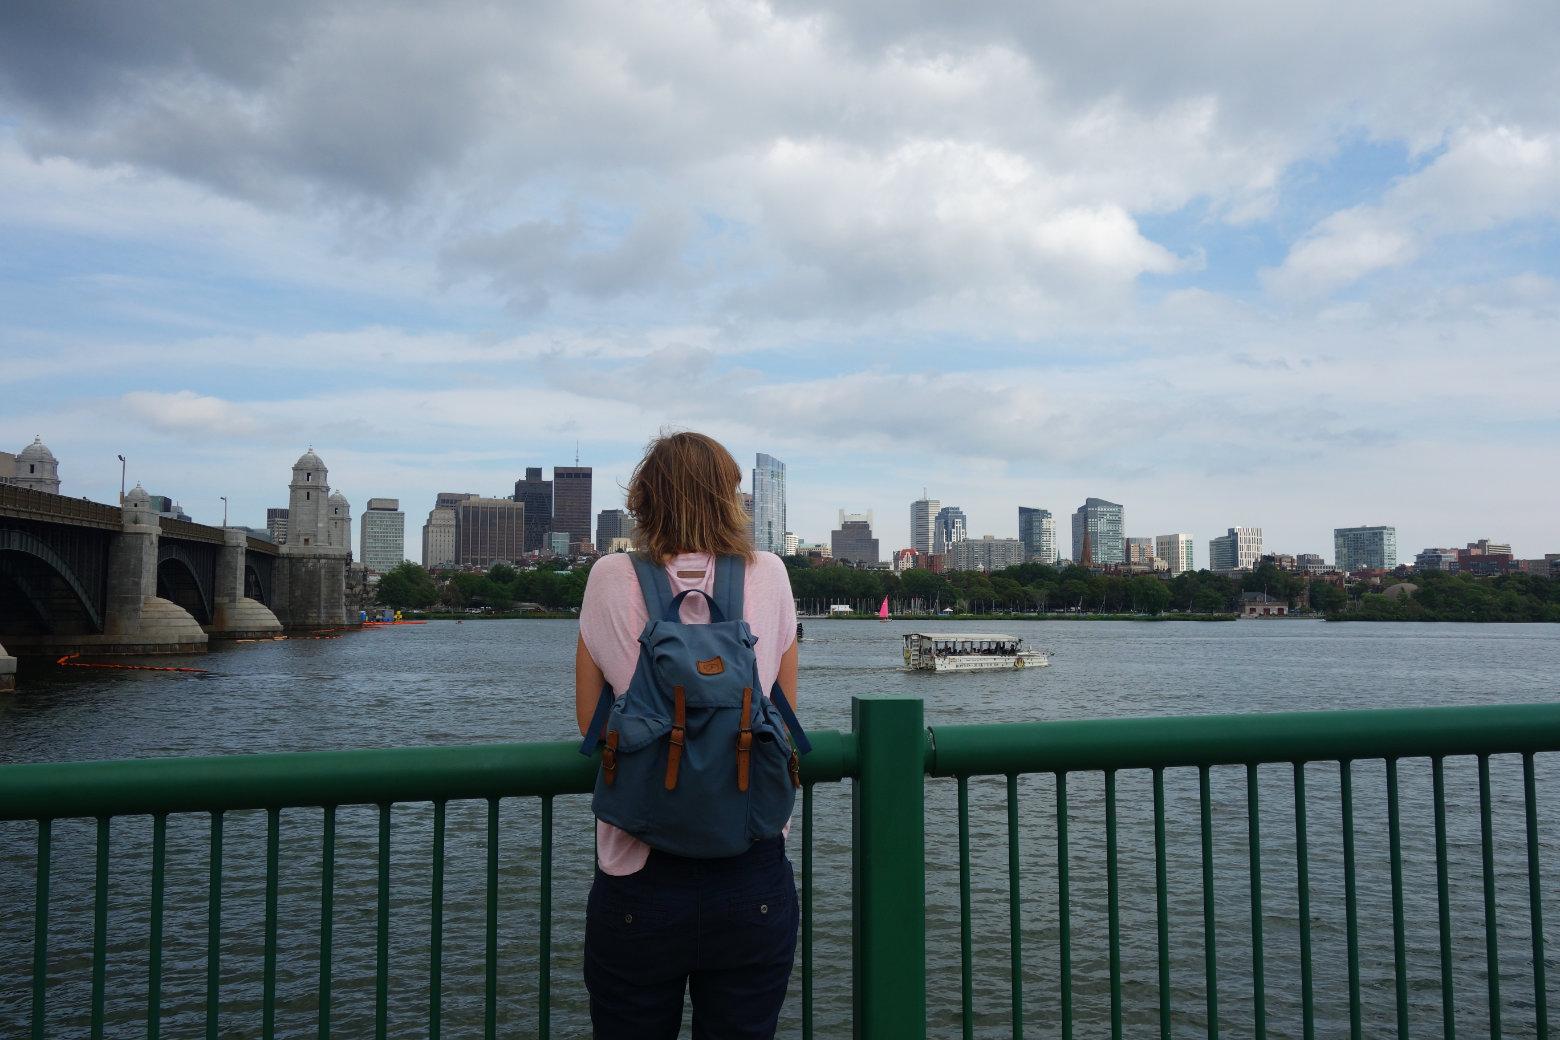 Boston Blick von Cambridge